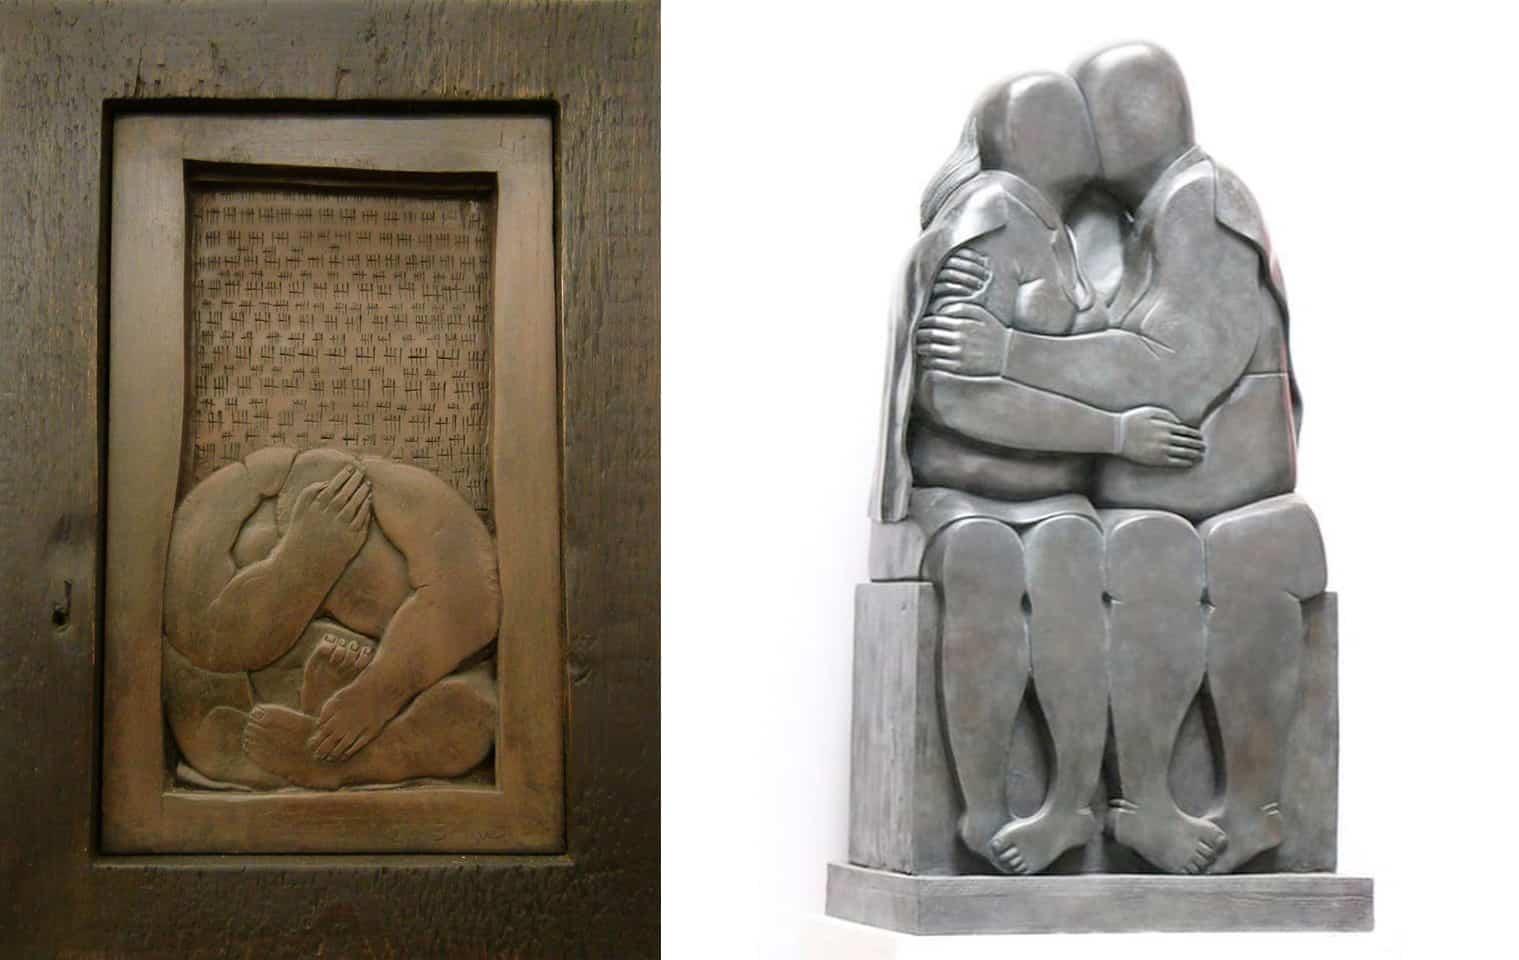 esculturas de Khaled DAWWA